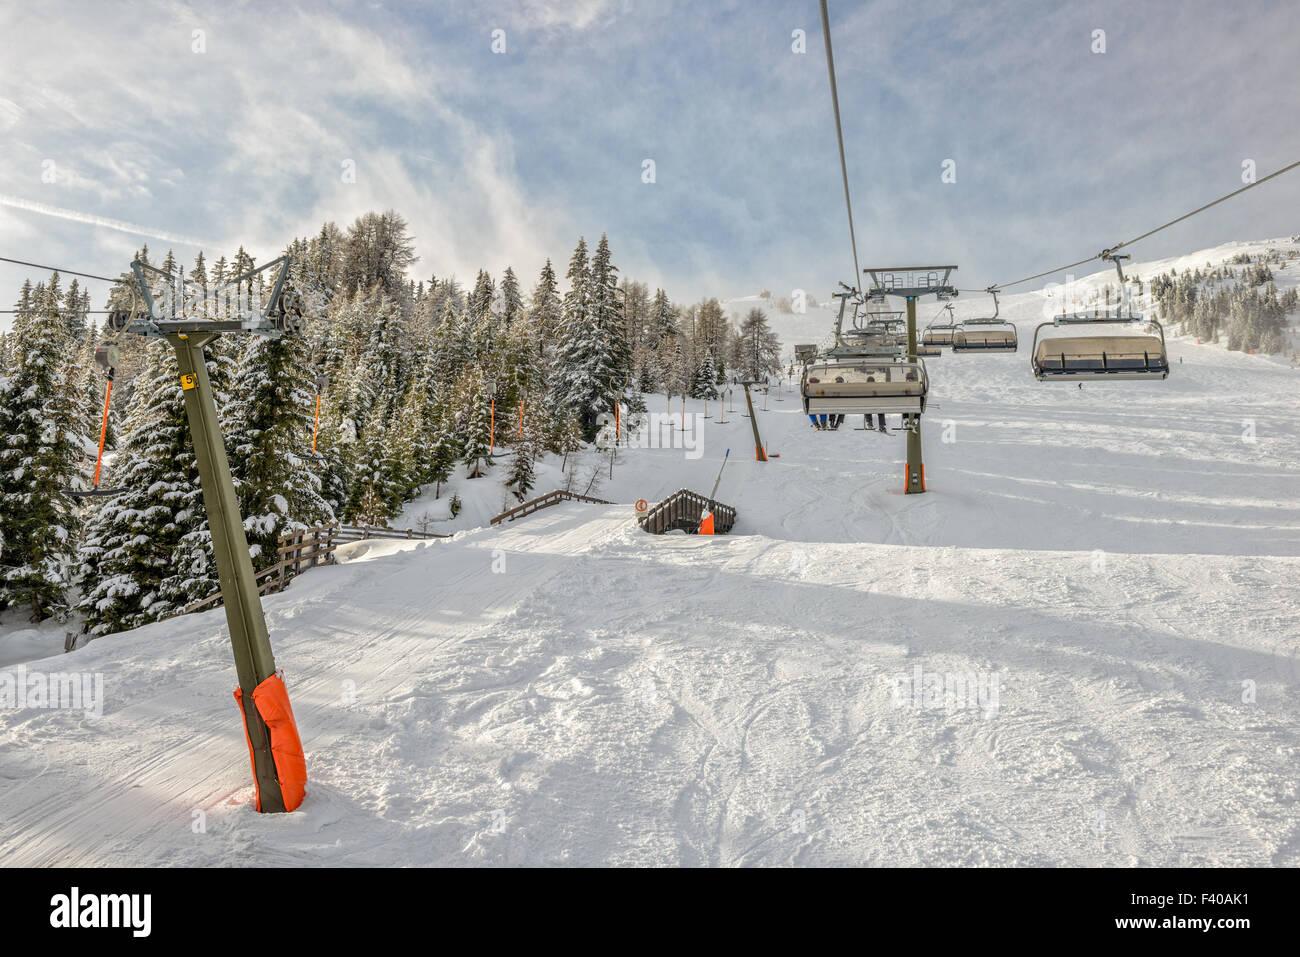 Chairlift at ski resort Stock Photo